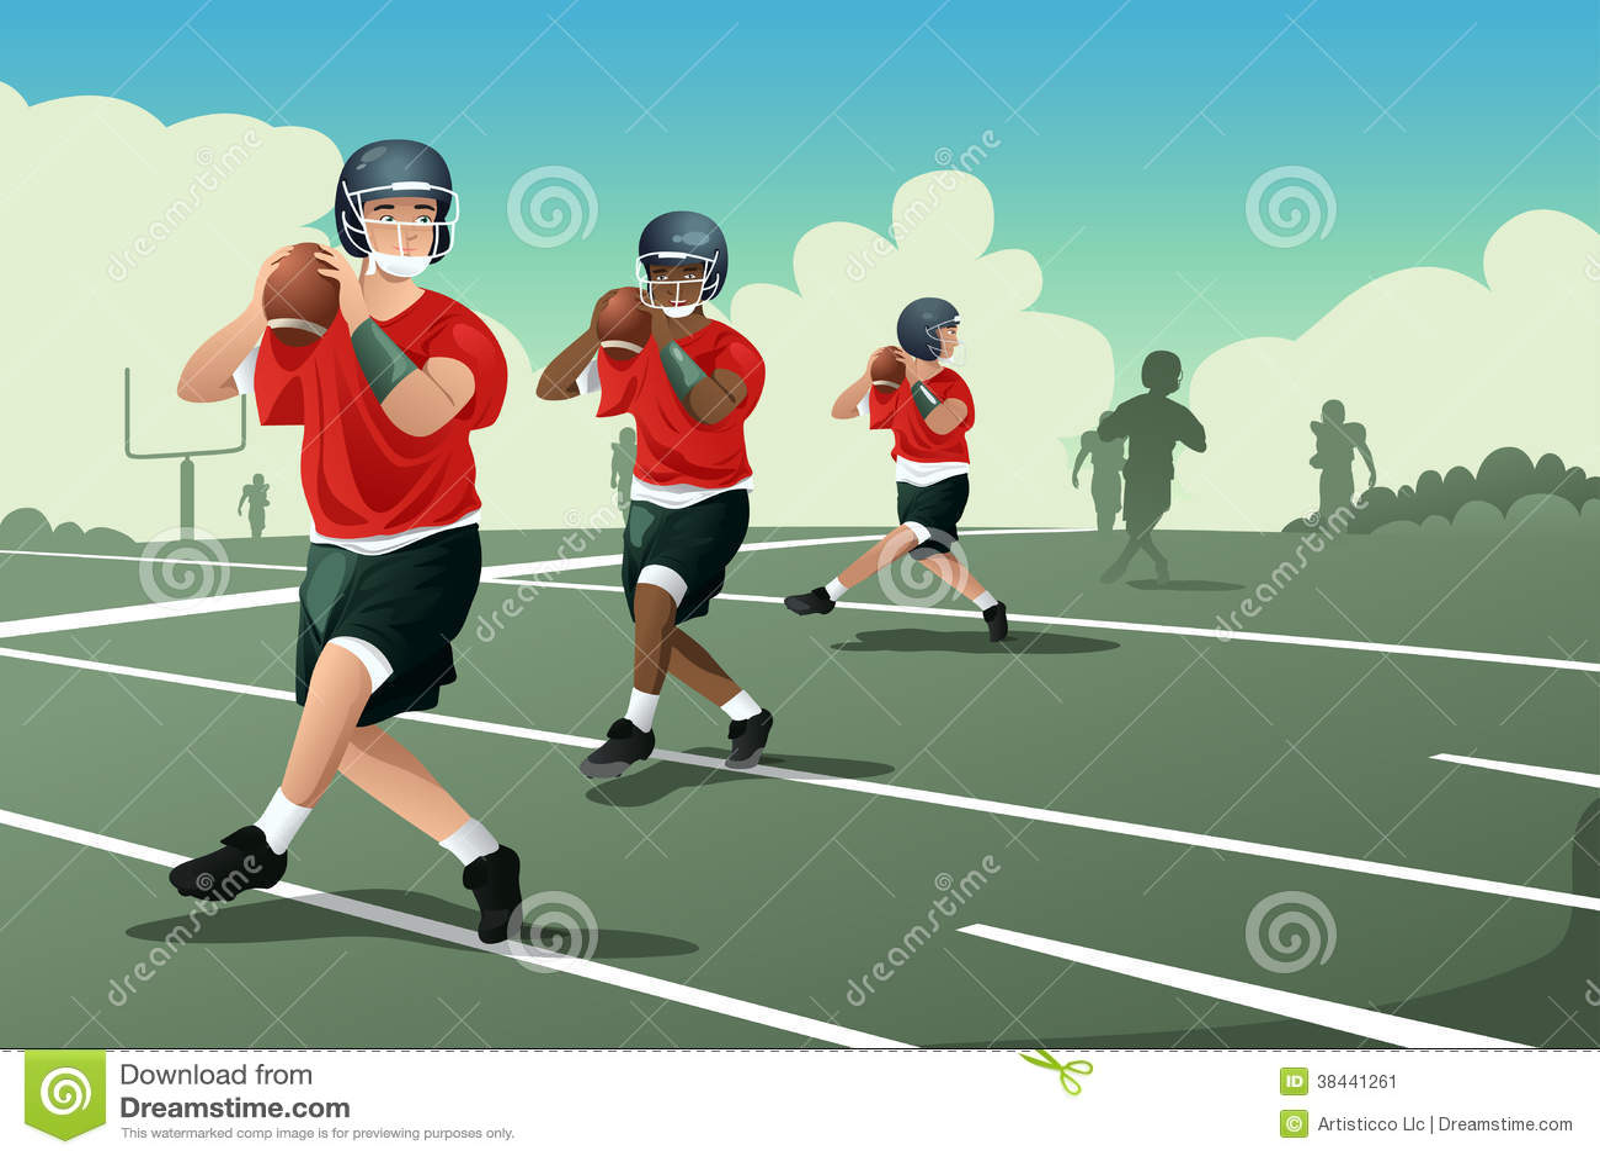 Kids In American Football Practice Stock Image - Image ...